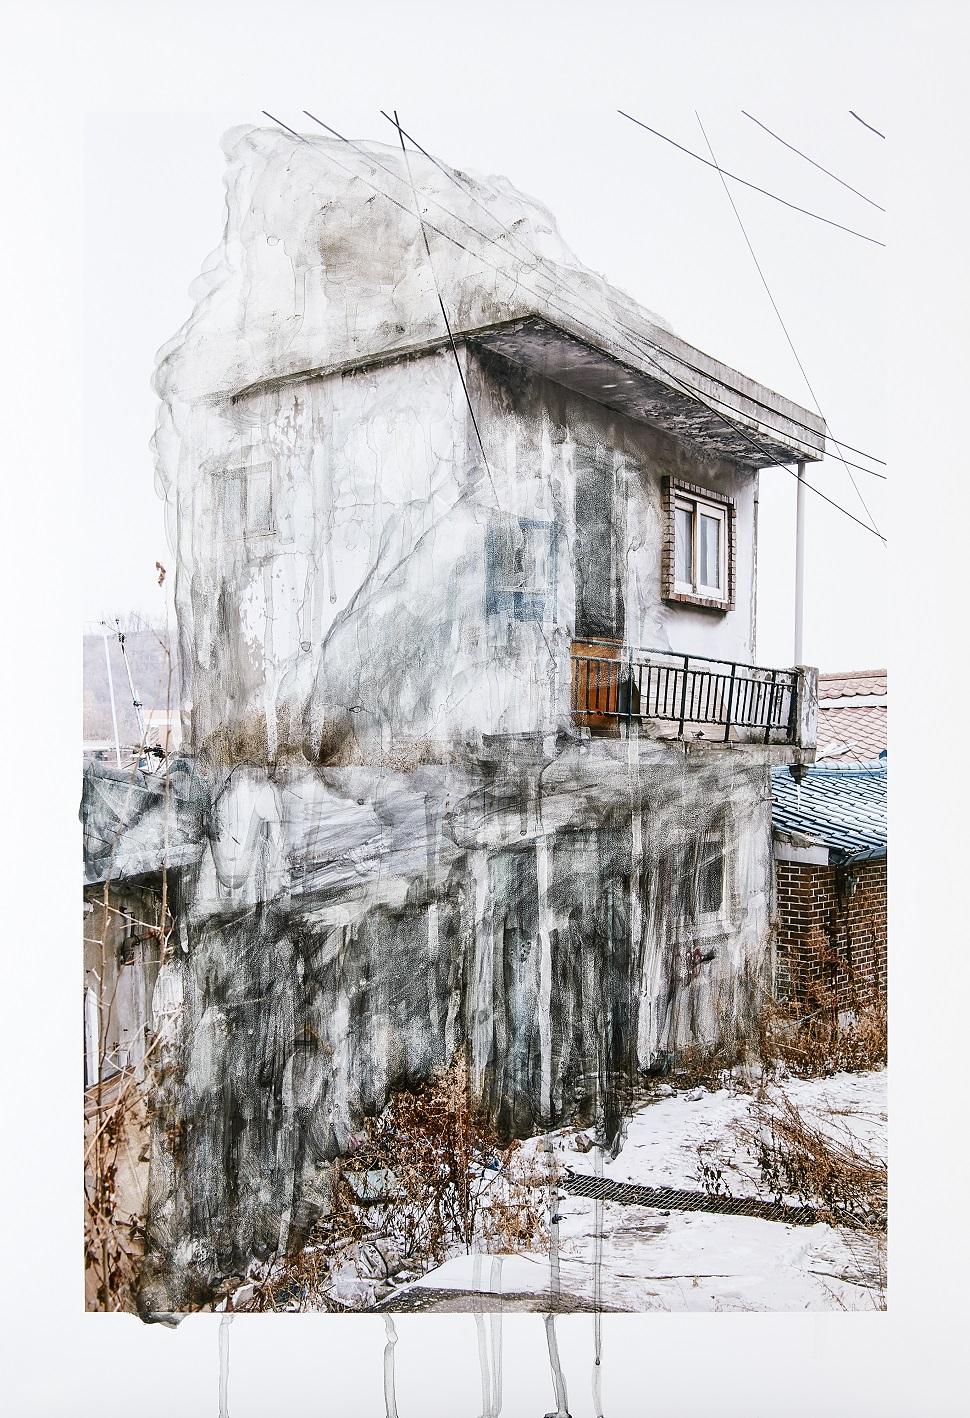 The Weathering_43x60cm_Pigment print, Acetone_2018